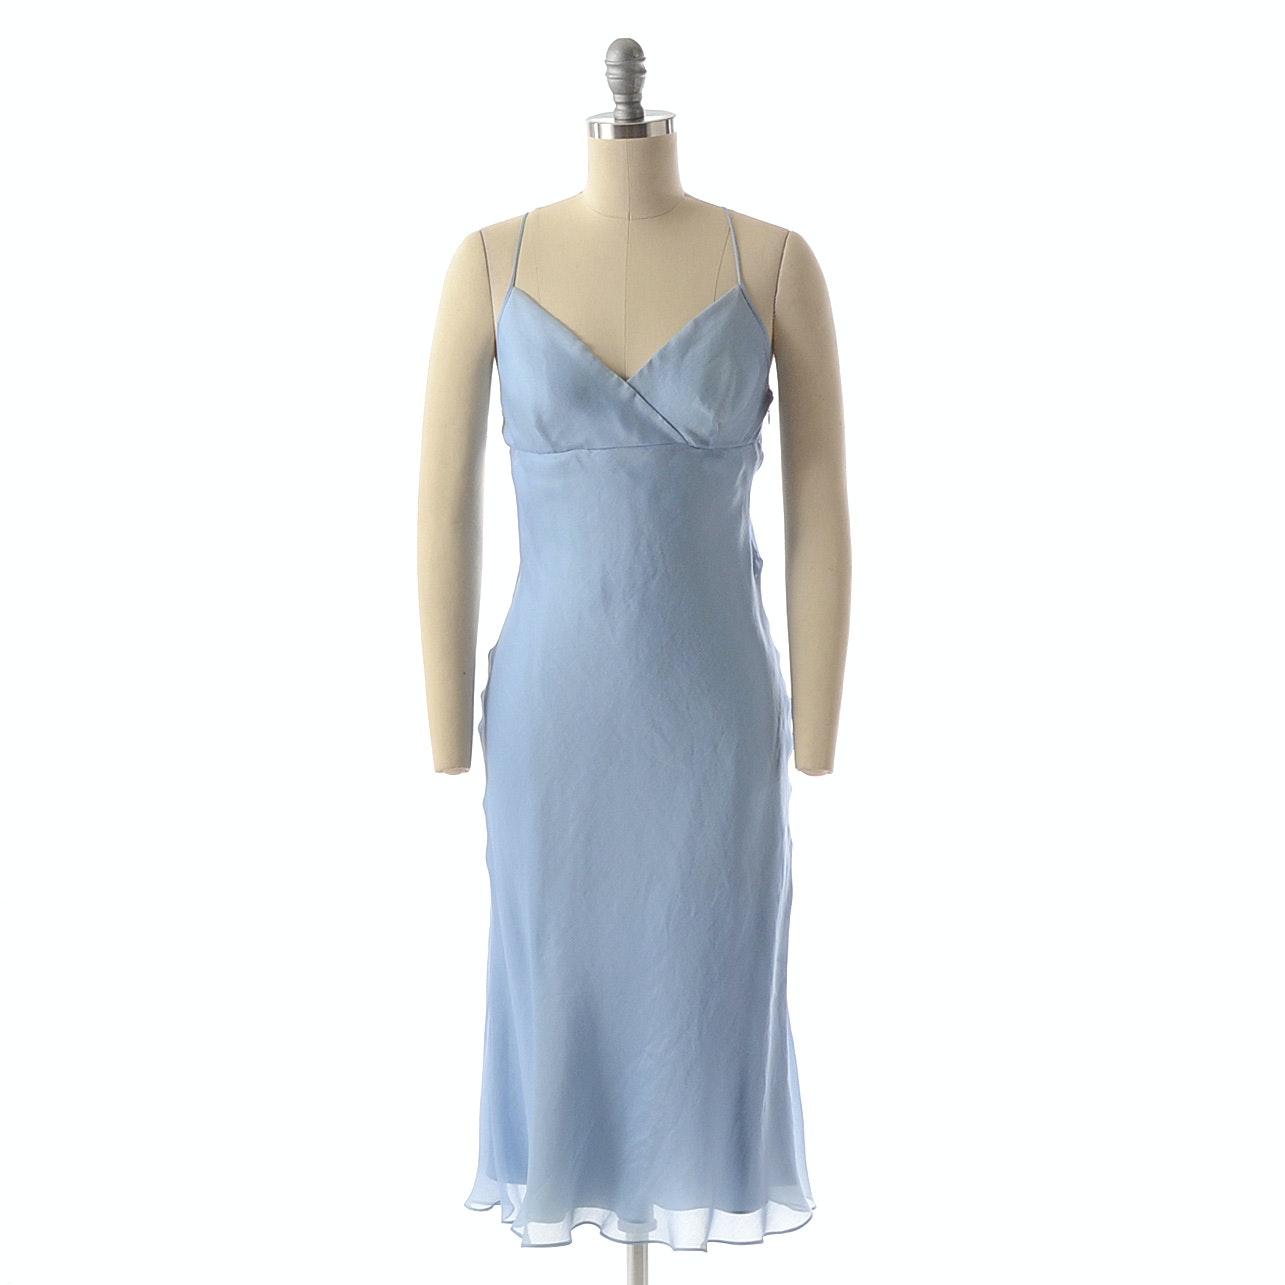 Silk Bias-Cut Nightgown